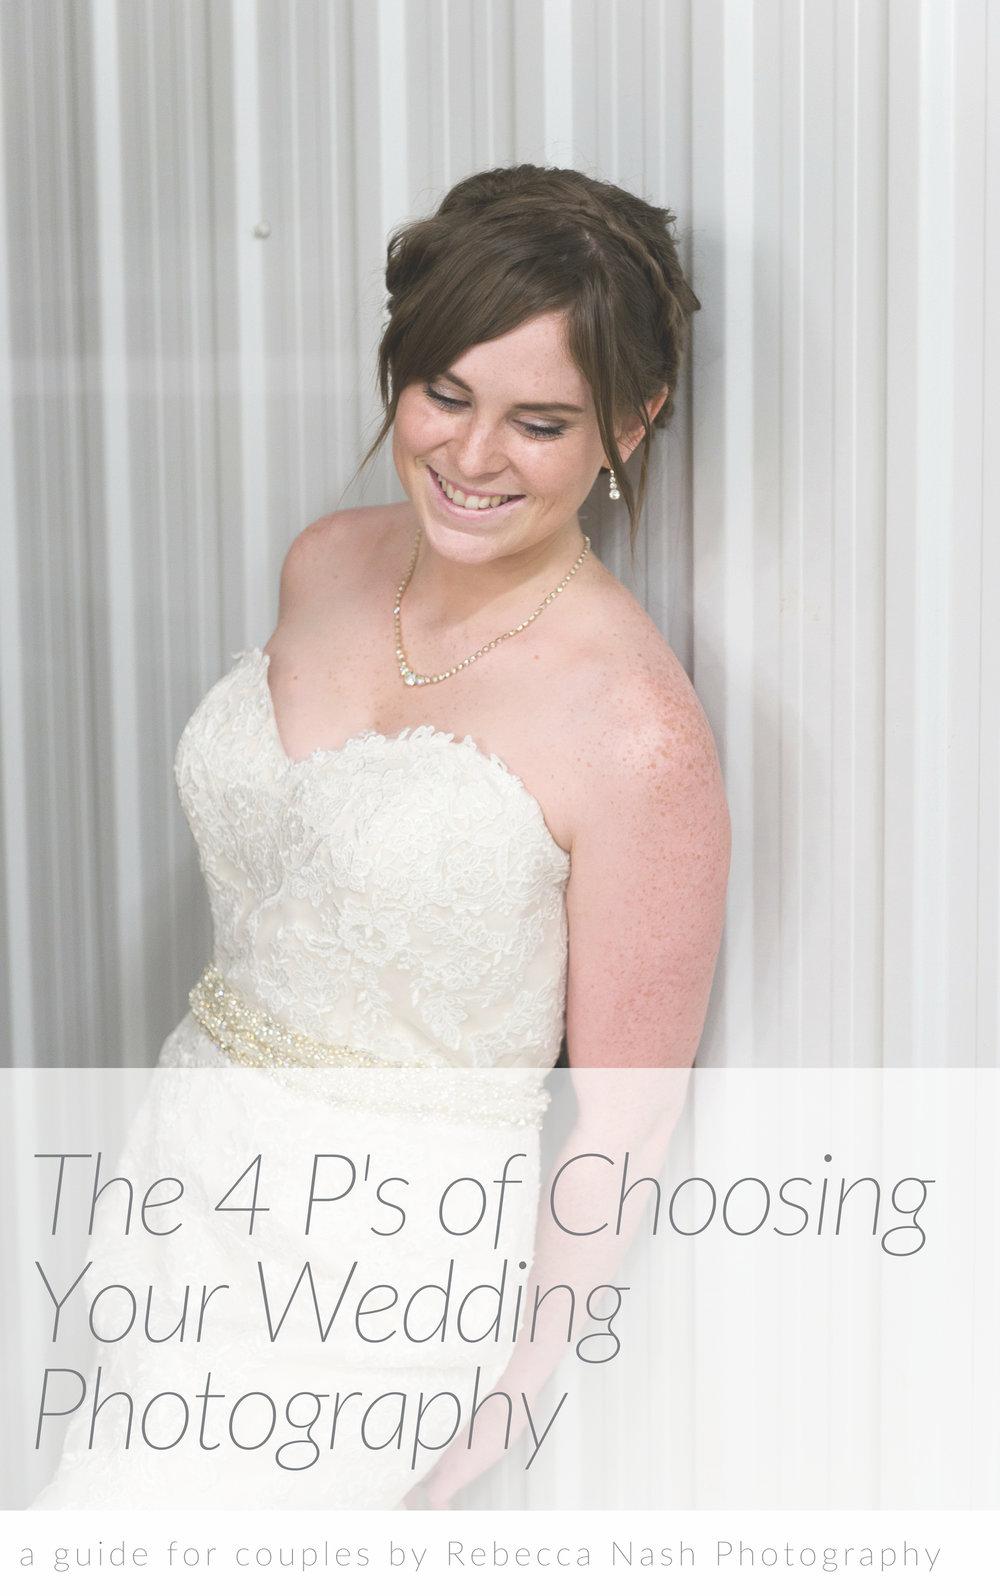 The 4 P's of Choosing A Wedding Photographer.jpg